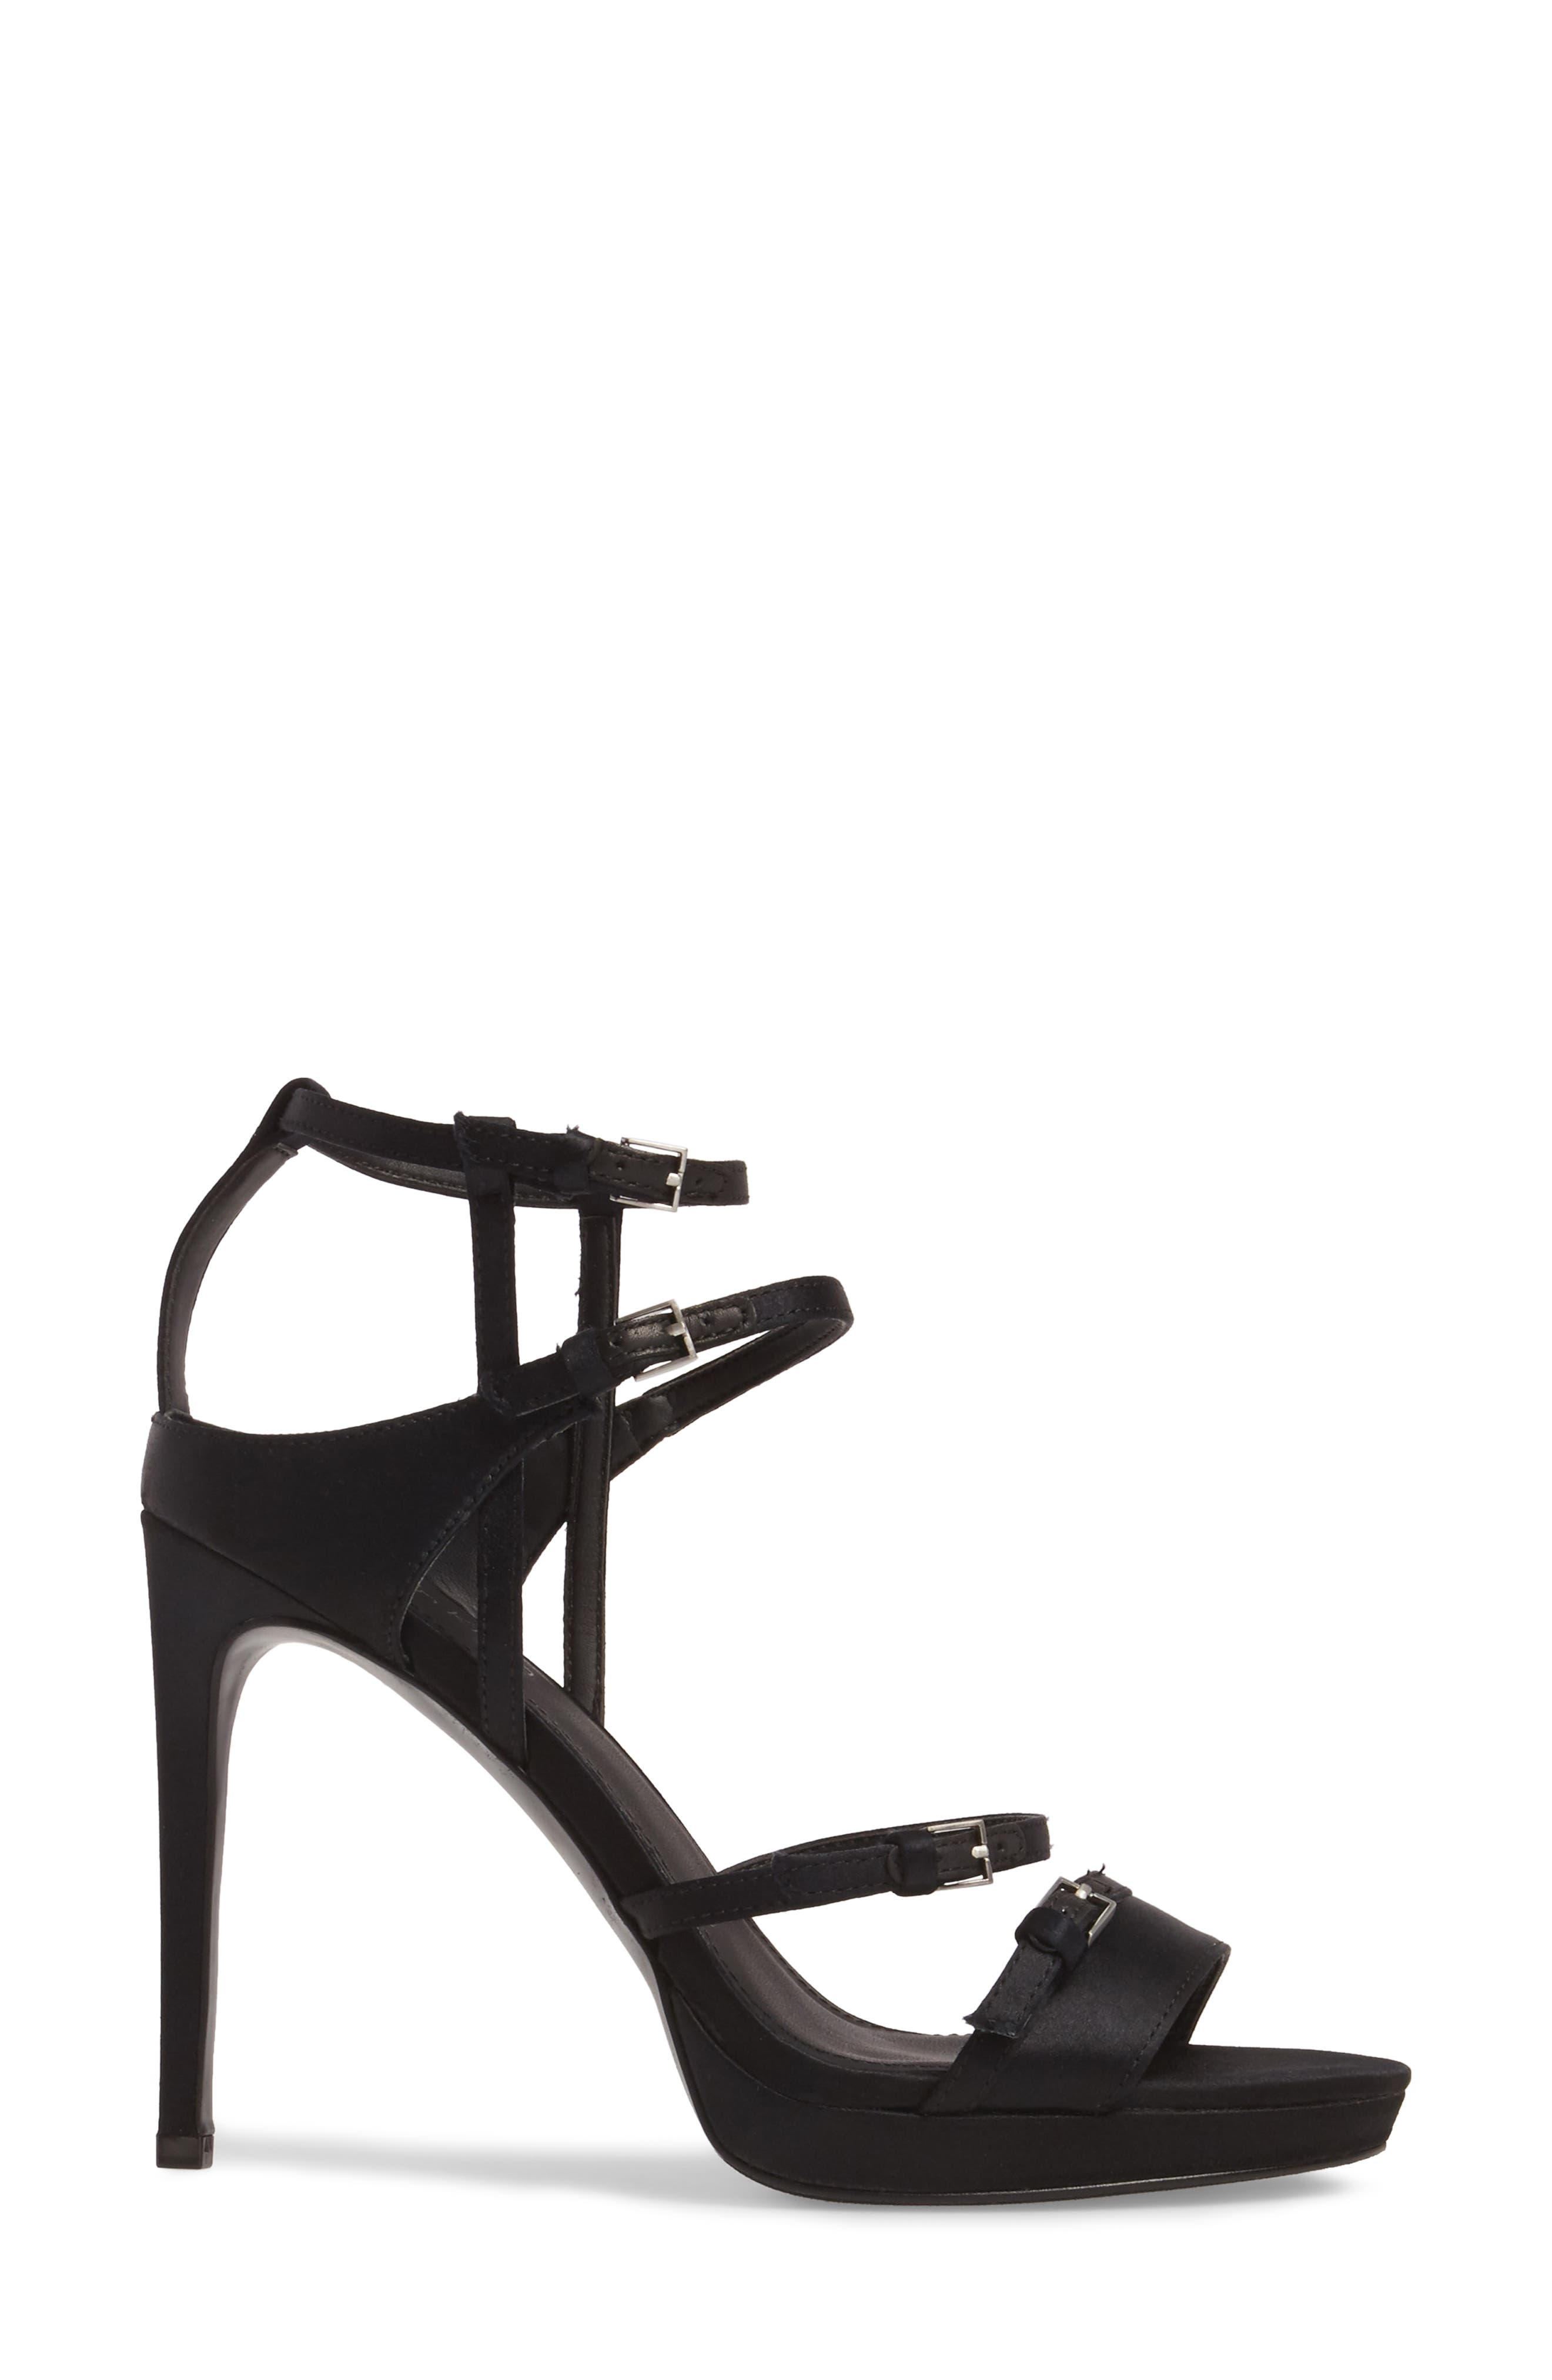 Shantell Strappy Platform Sandal,                             Alternate thumbnail 3, color,                             001